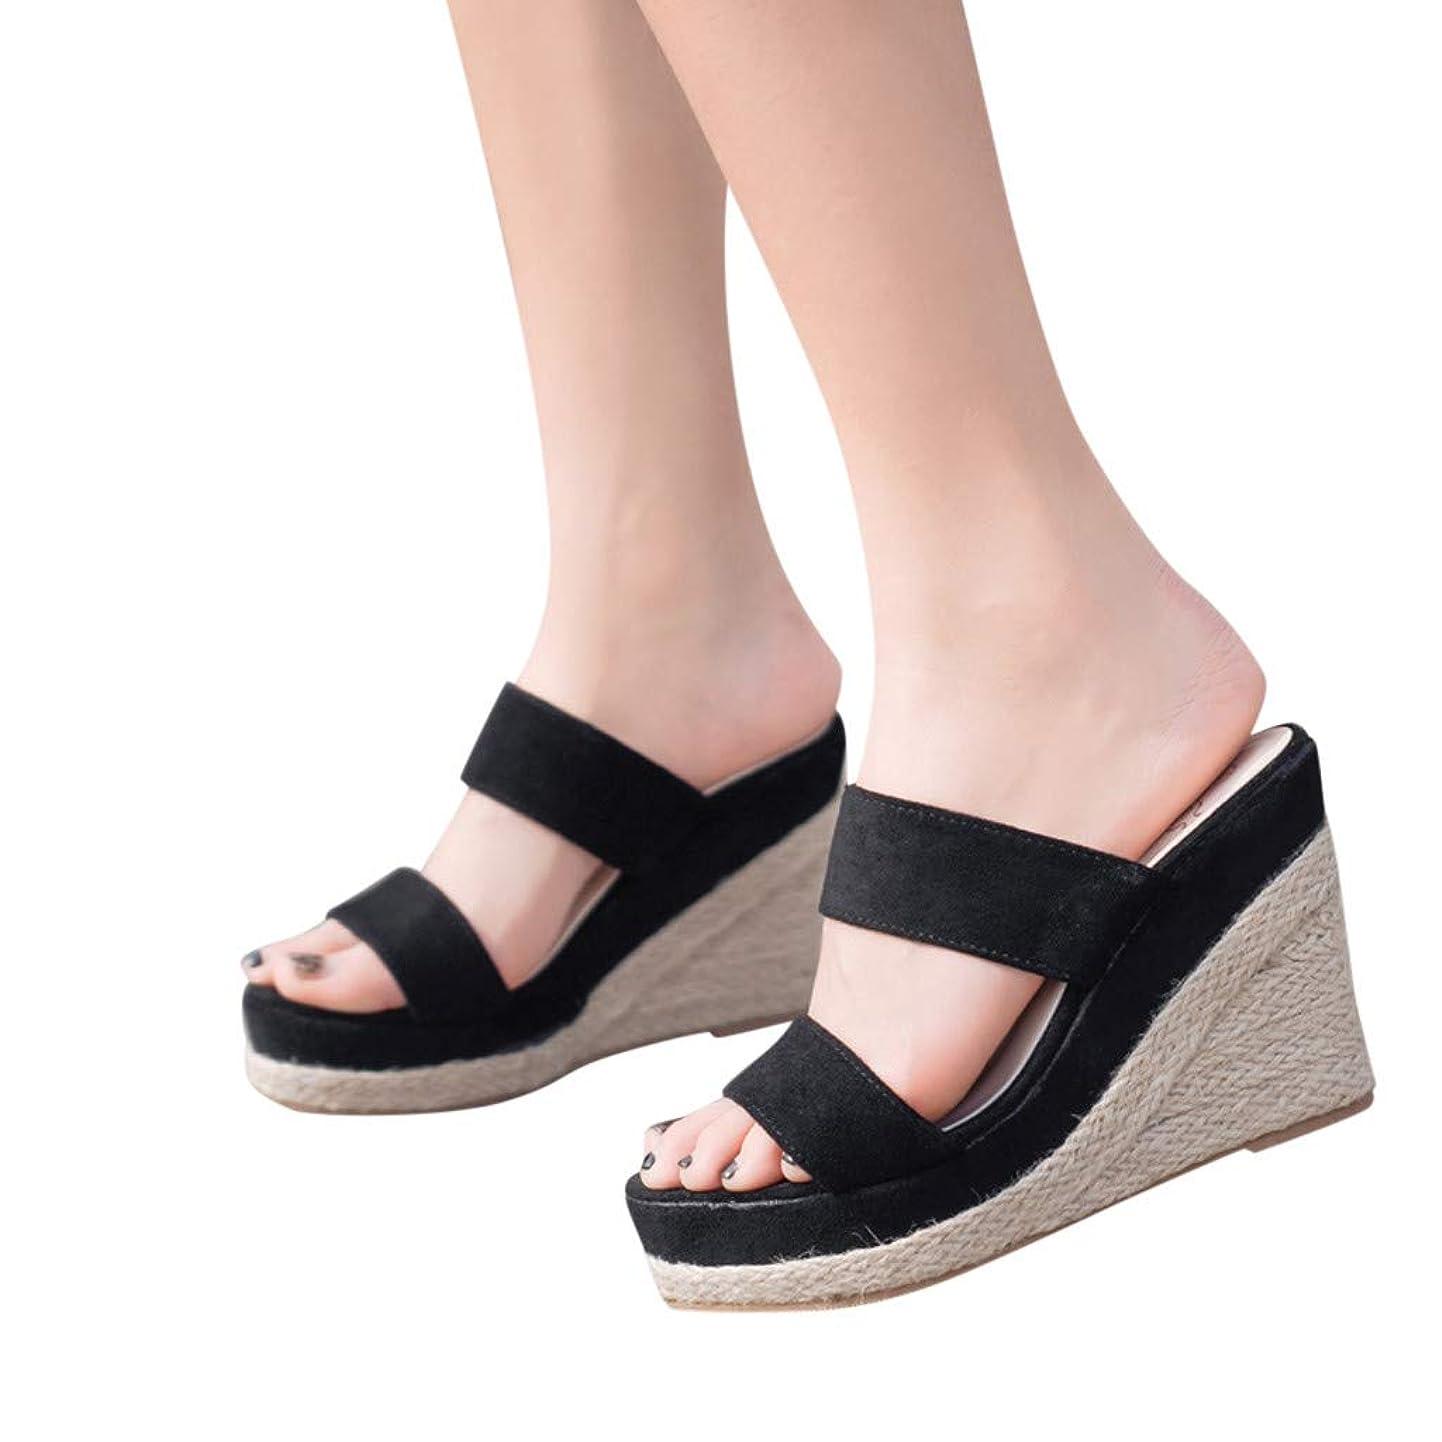 Dasuy Women's Platform Wedge Espadrille Sandals Women Suede Open Toe Weaving Flats Slippers Flip Flops Beach Shoes xlmqpqcozyo4